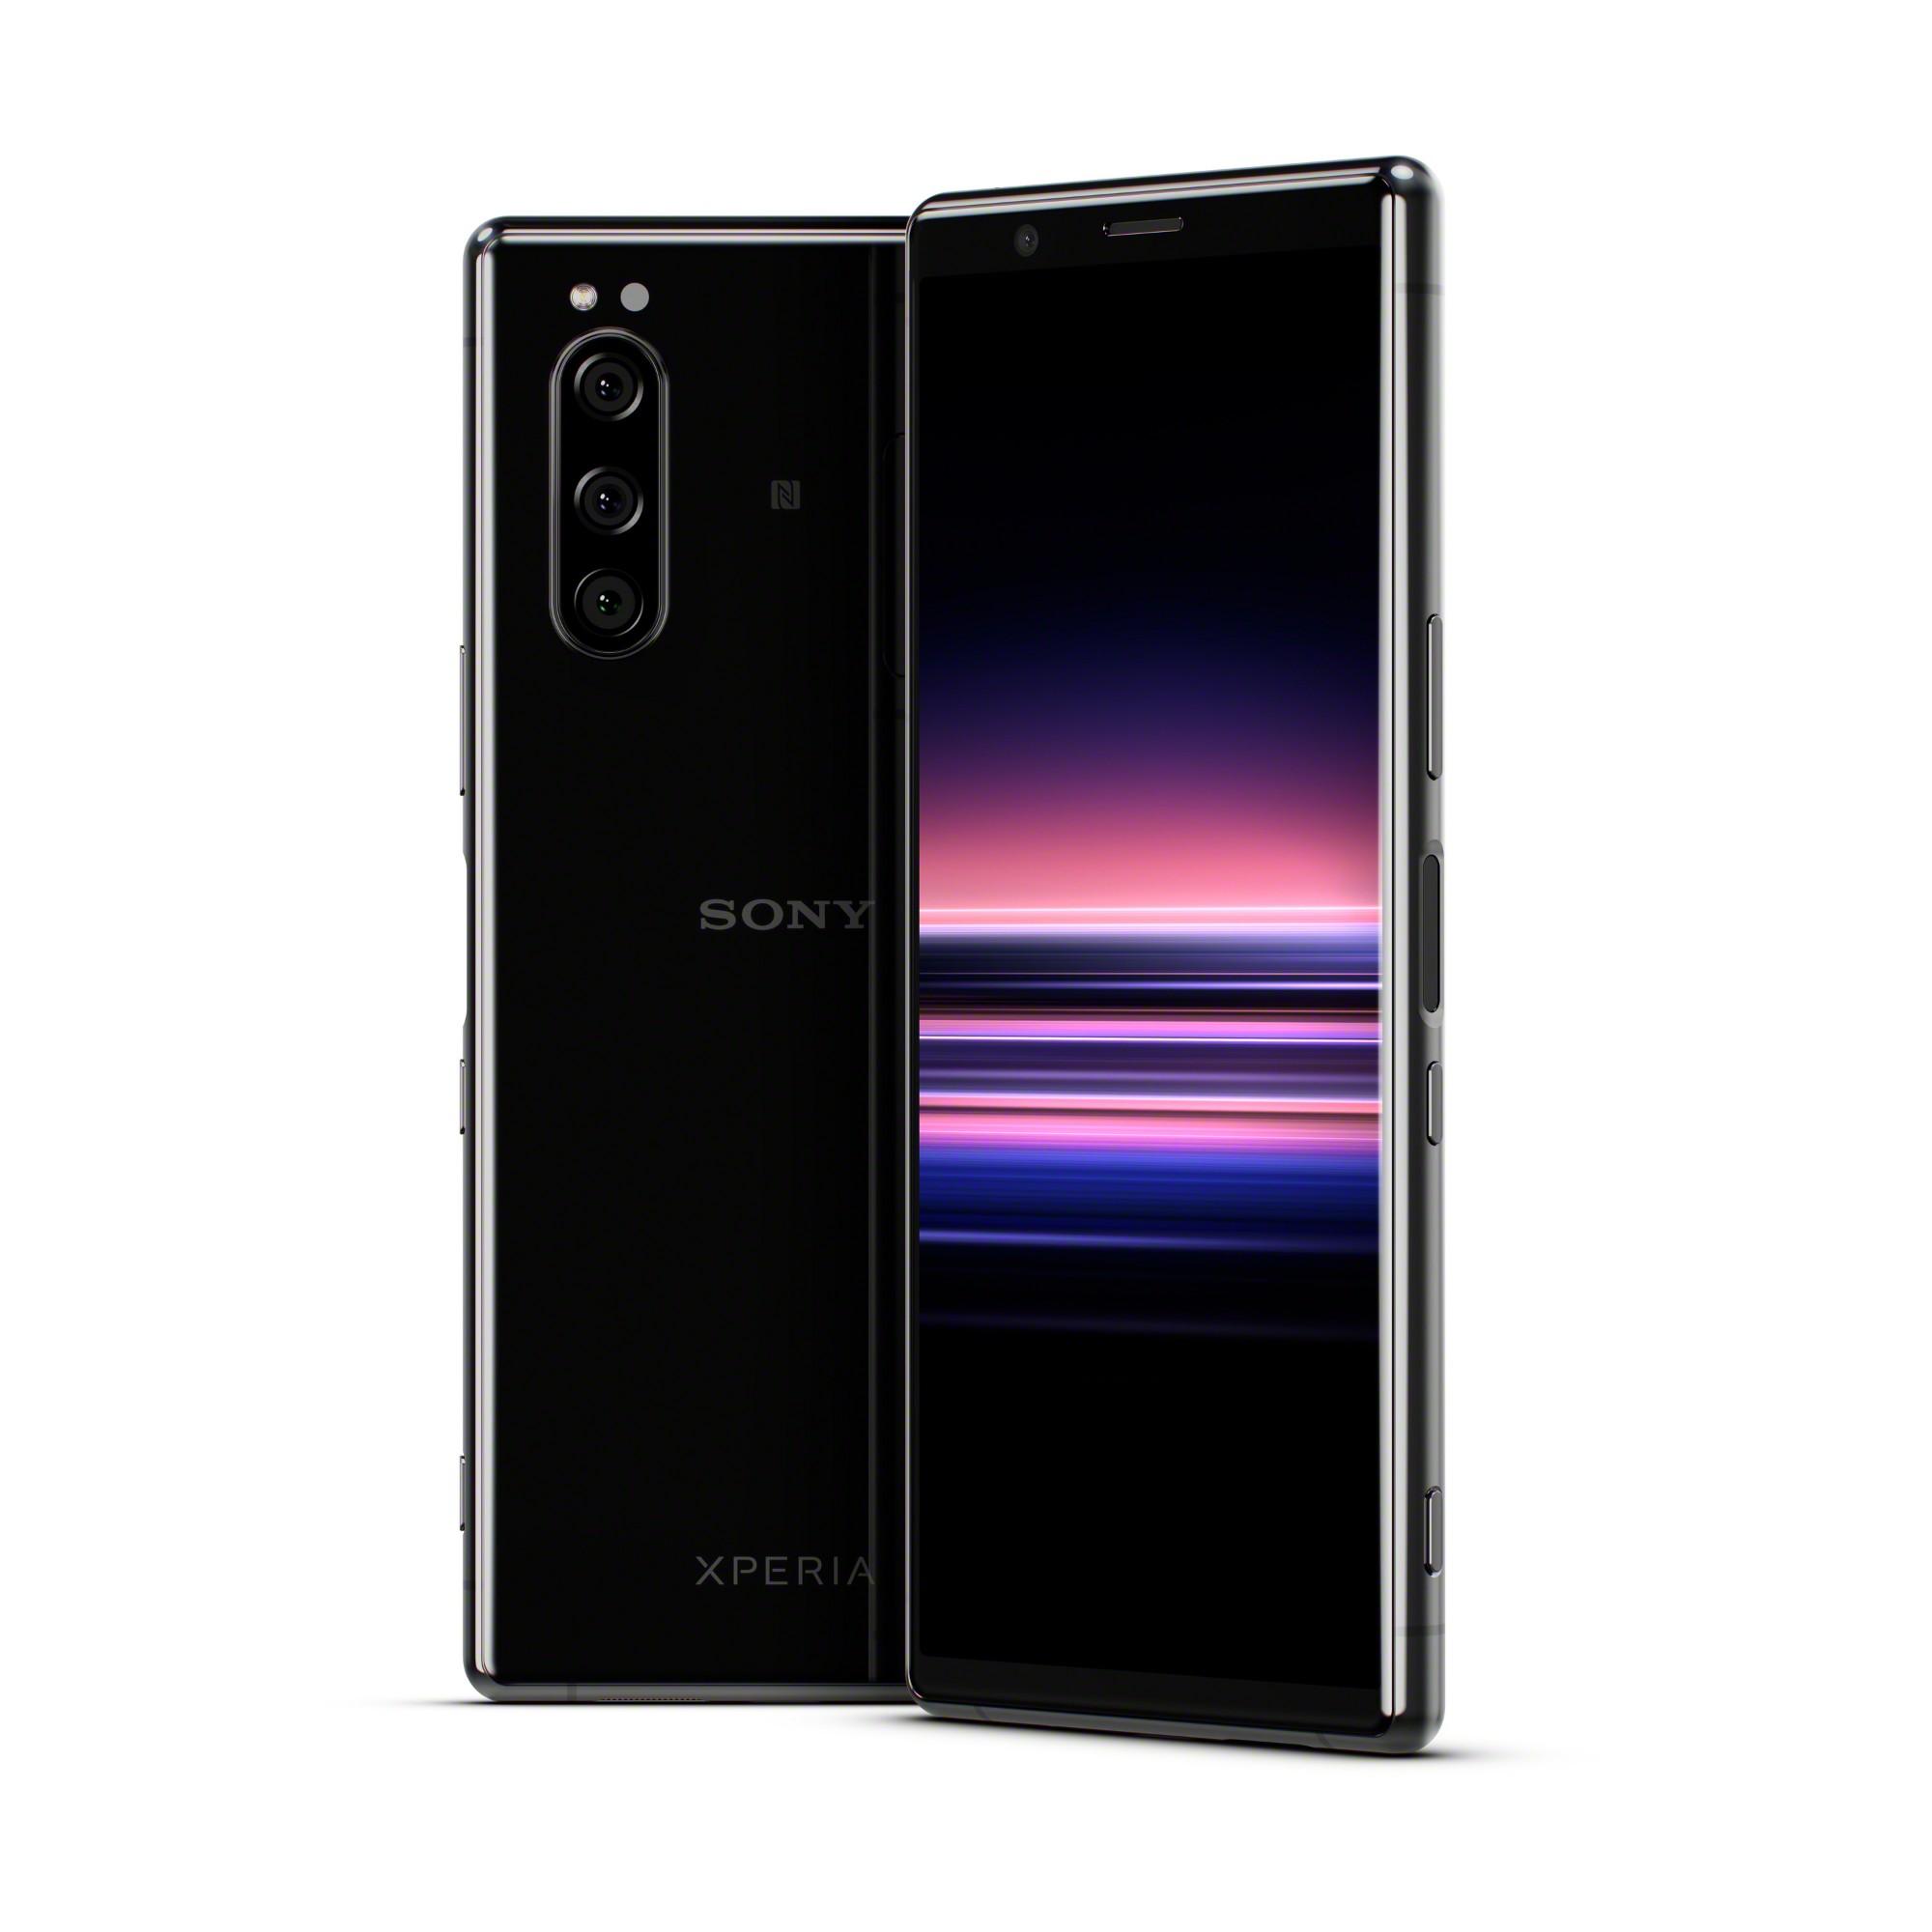 "Sony Xperia 5 15,5 cm (6.1"") 6 GB 128 GB 4G USB Tipo C Negro Android 9.0 3140 mAh"